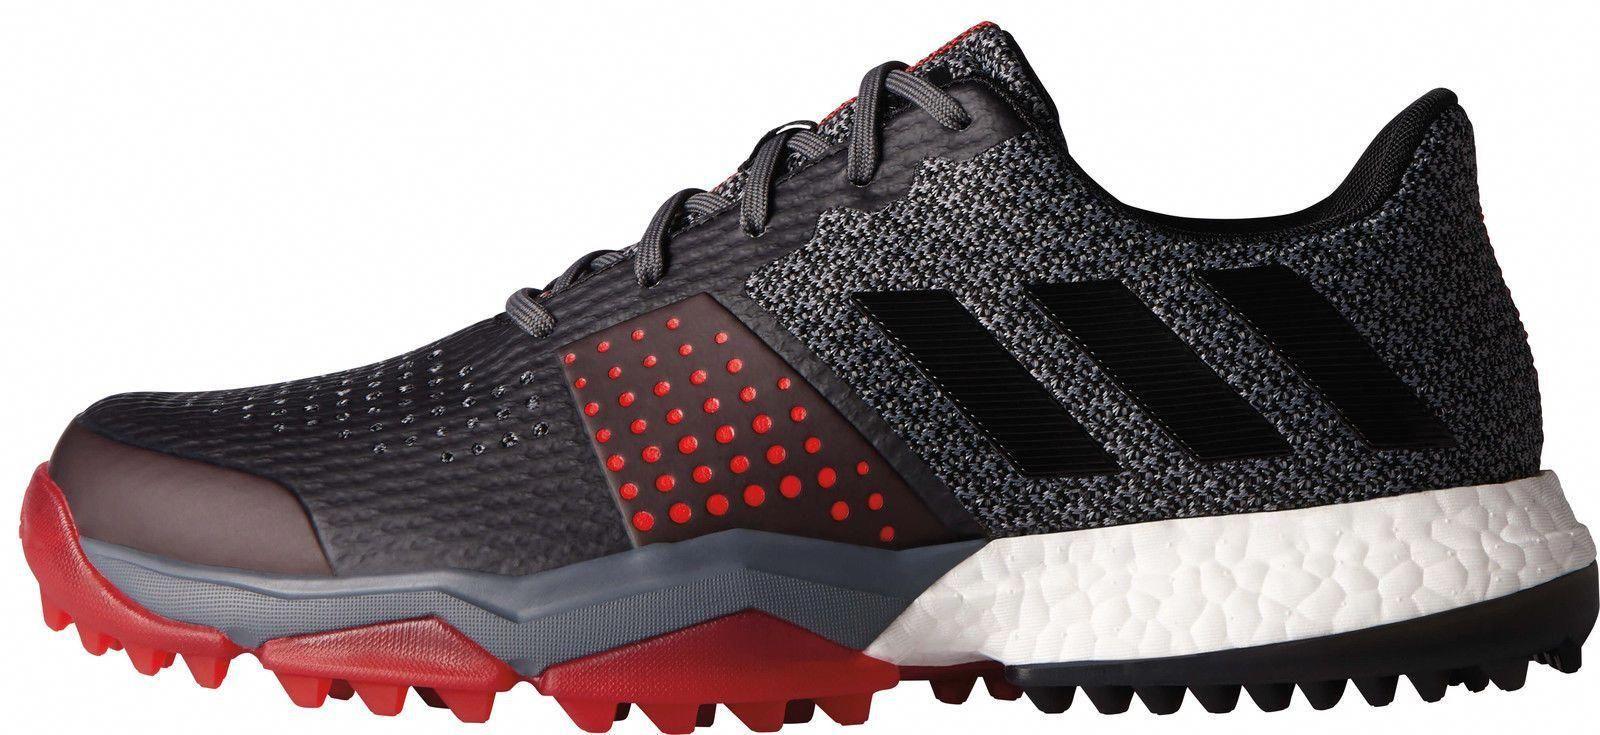 Adidas Adipower S Boost 3 Golf Shoes Q44778 Onix//Black/Scarlet ...